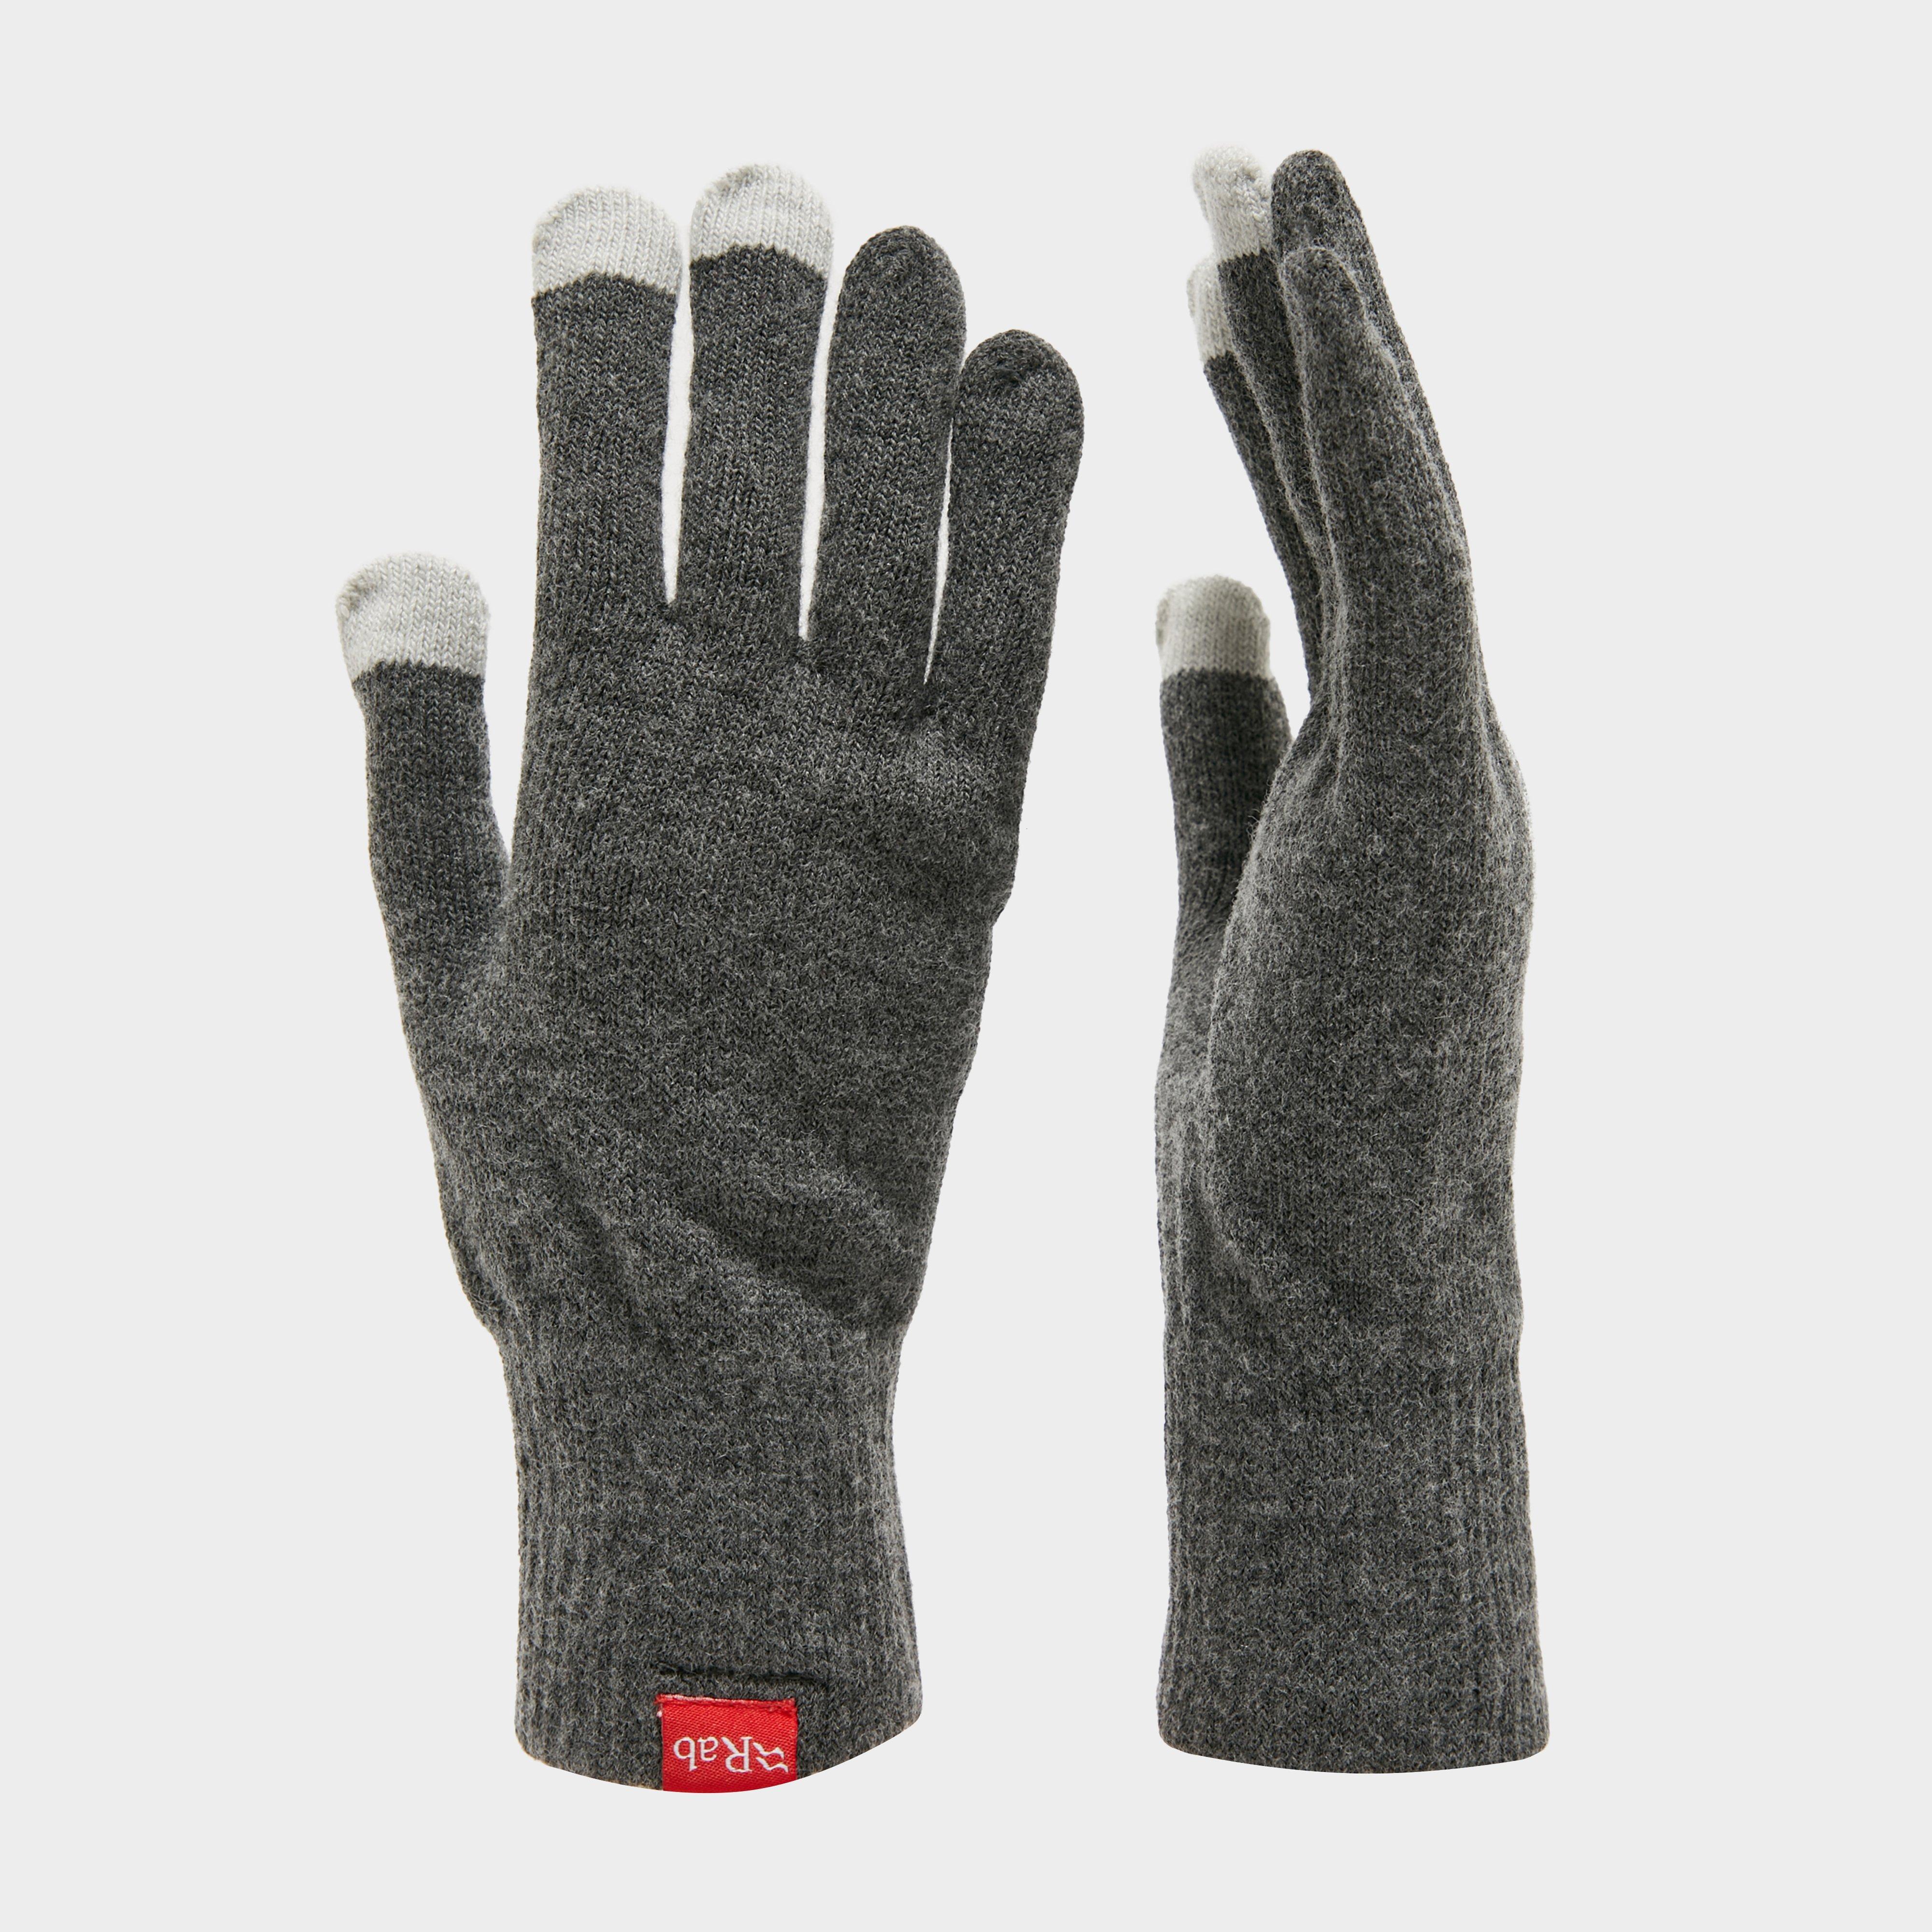 Rab Rab Primaloft Glove - N/A, N/A